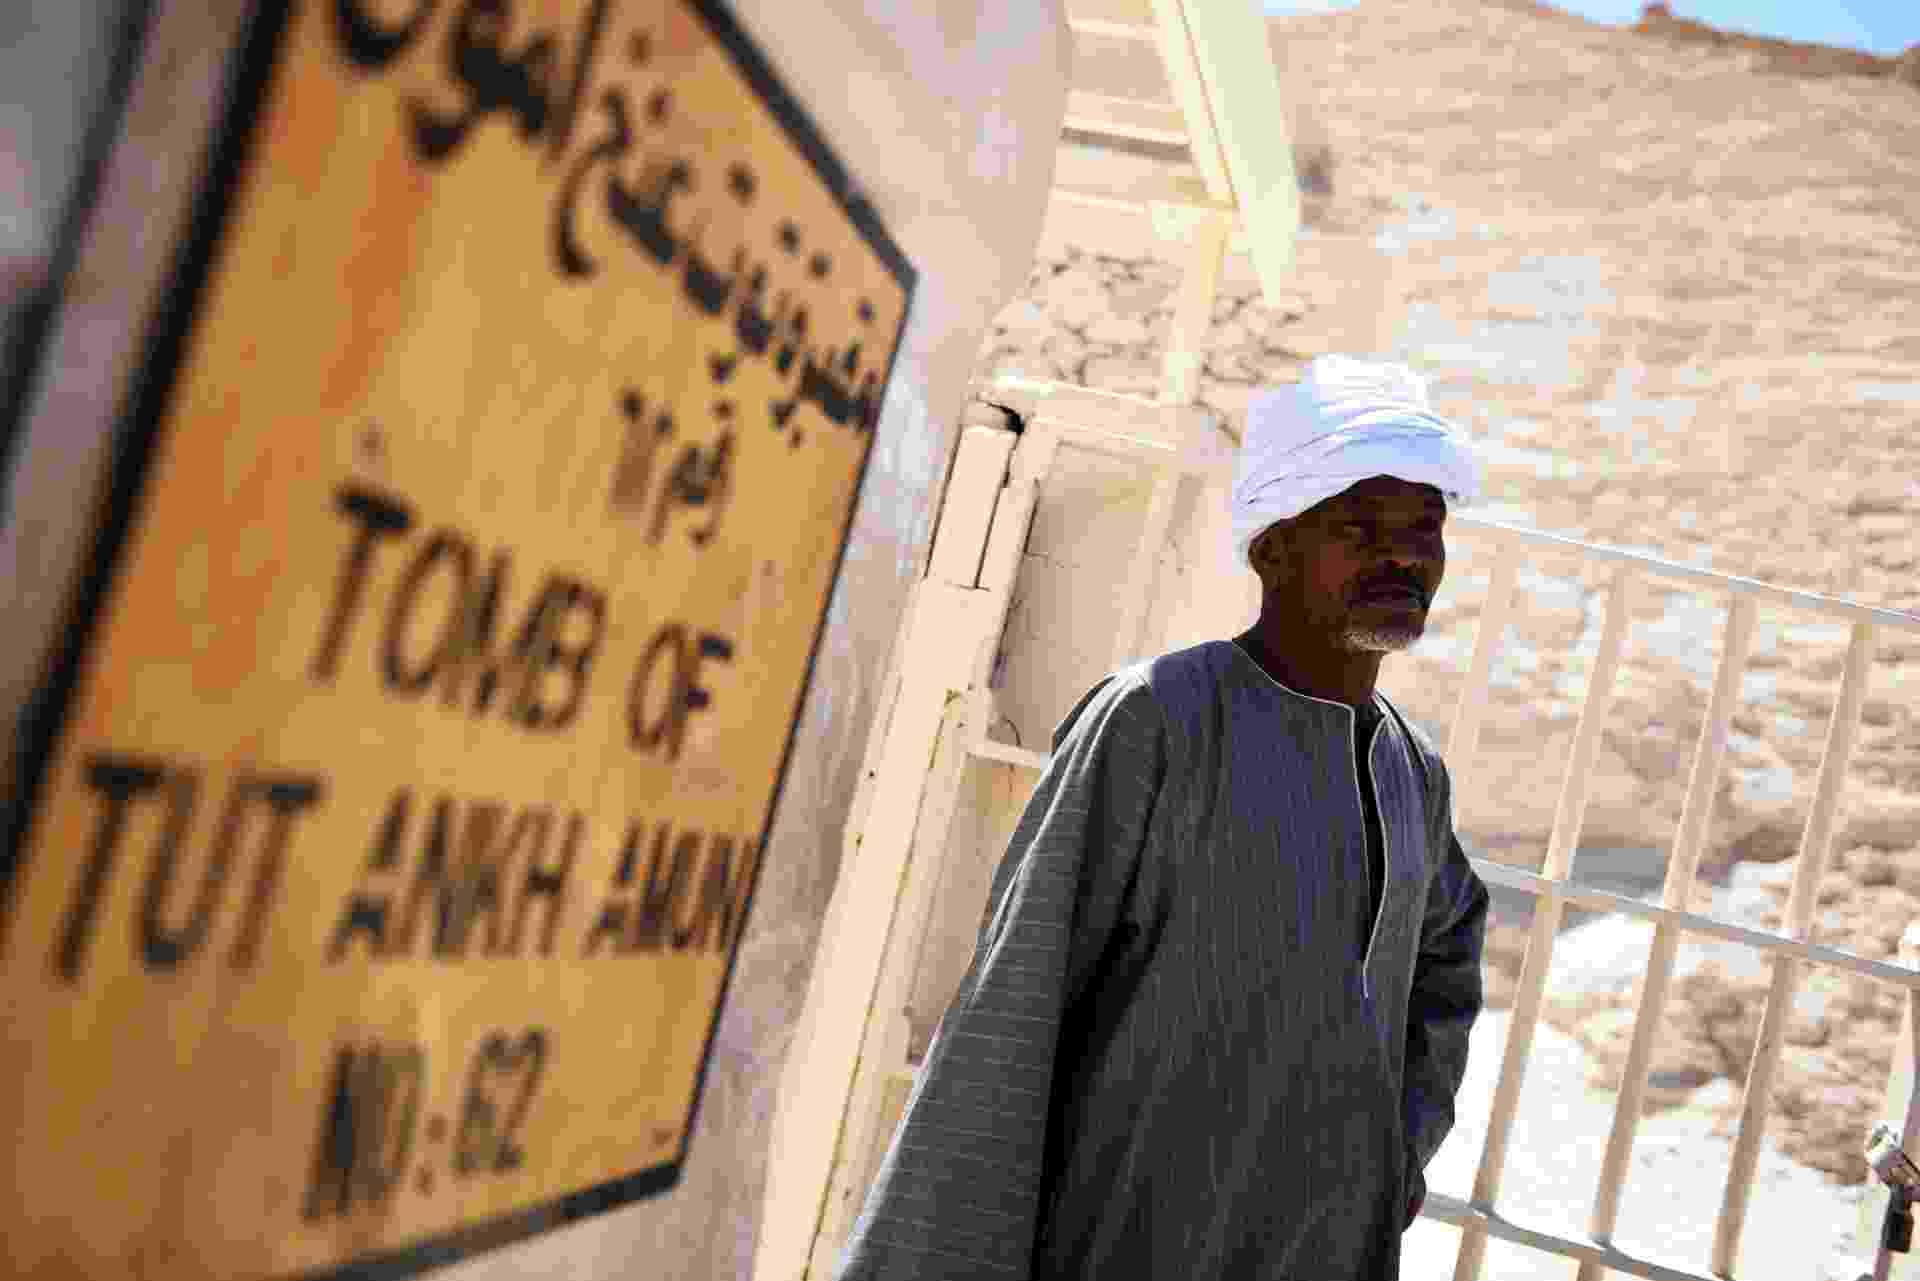 1.abr.2016 - Entrada da tumba de Tutancâmon, no Egito - Mohamed El-Shahed/AFP Photo